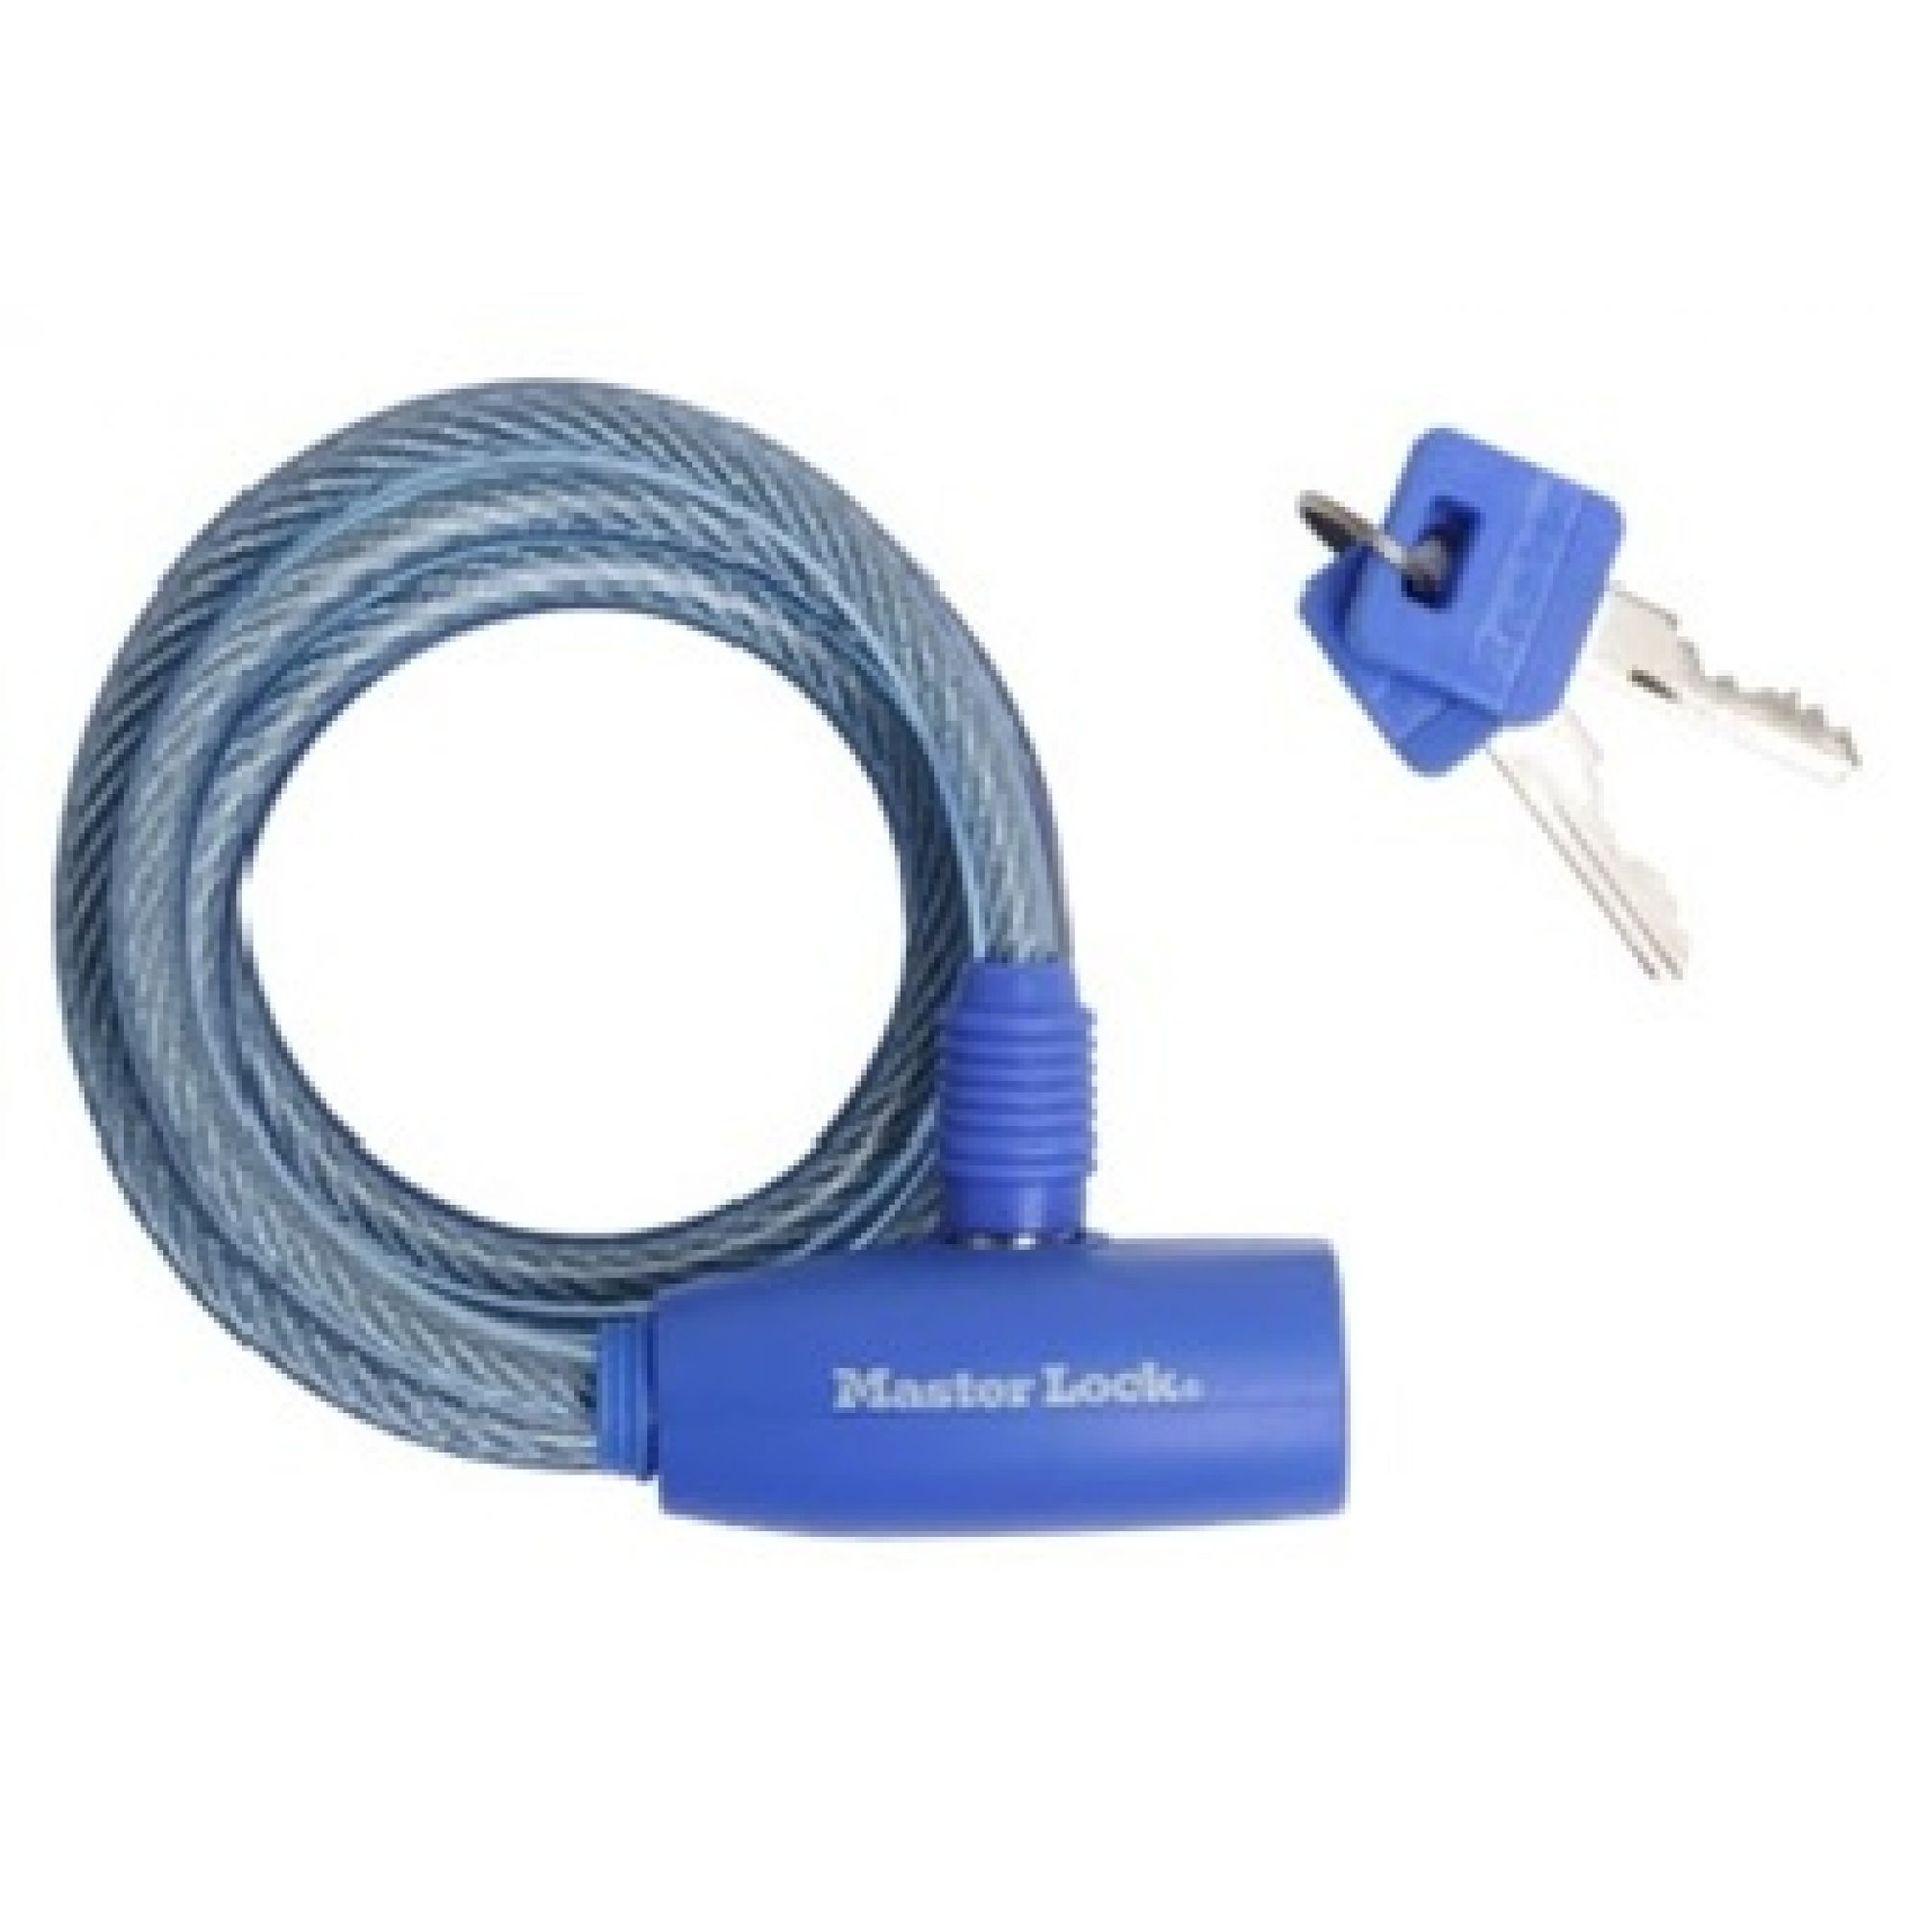 Zapięcie rowerowe Master Lock Quantum 8212 niebieskie